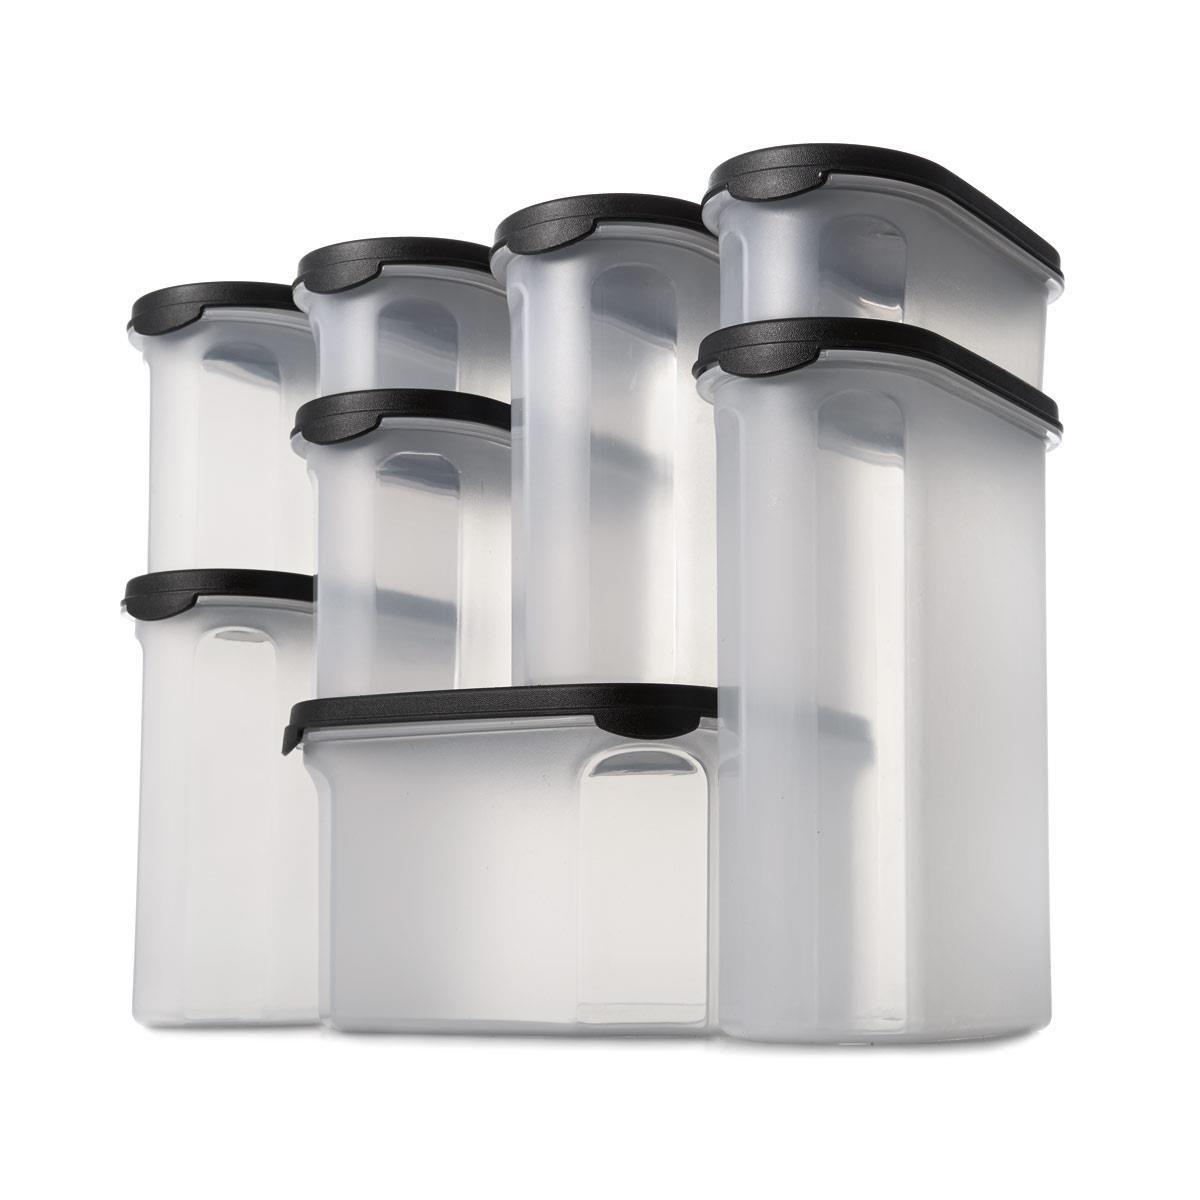 8 Piece Pantry Storage Set | Kmart